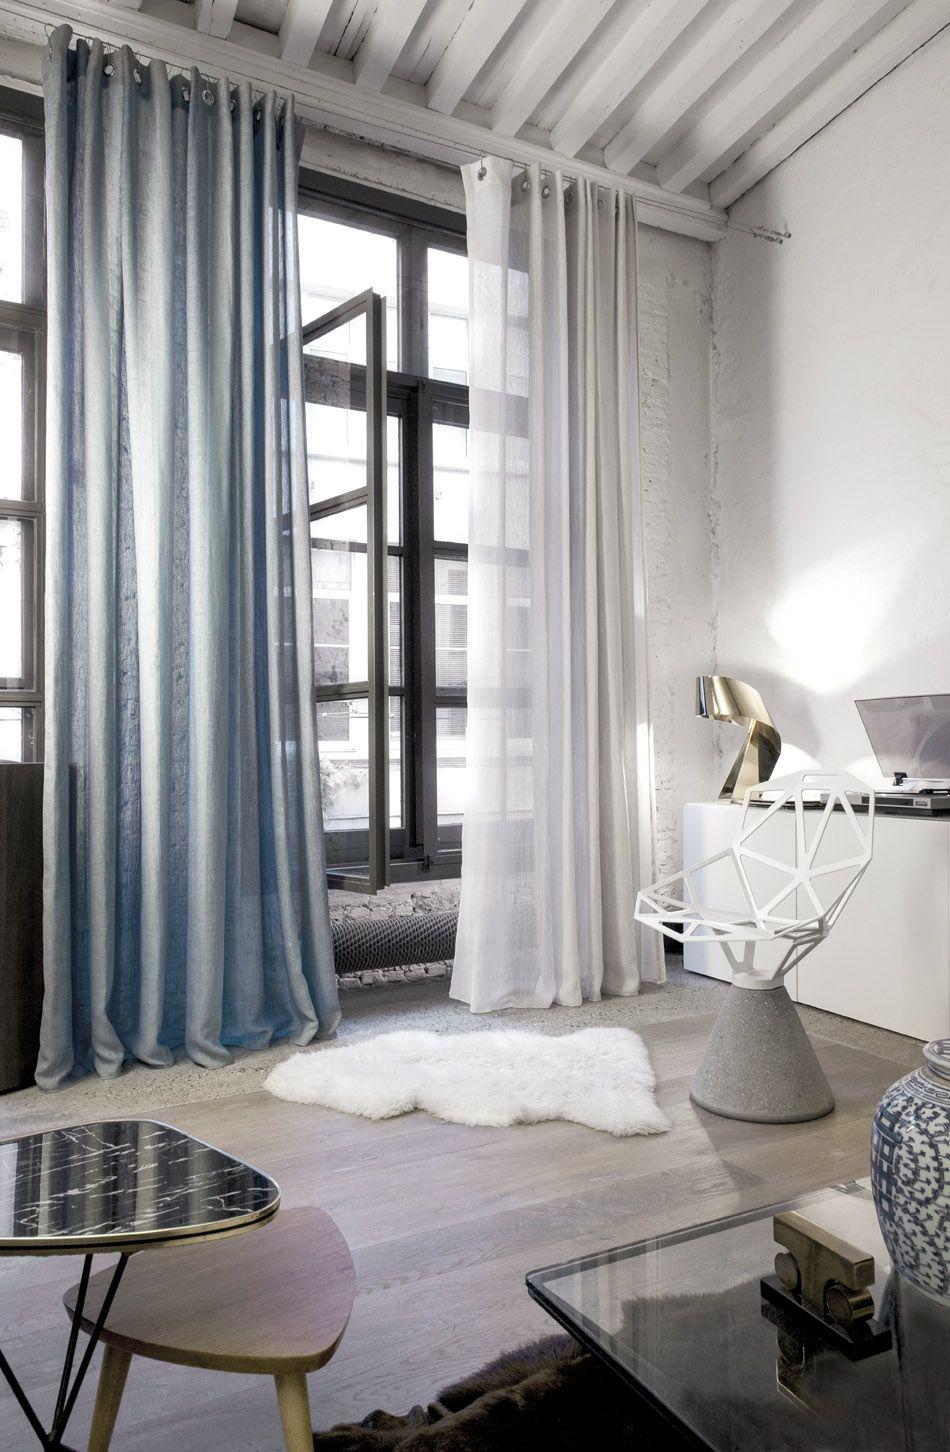 marrakech chillipepper_17172 overgordijn gordijnen ramen raamdecoratie blauw en wit transparant rideau rideaux maroc atmosphere intrieur fentre